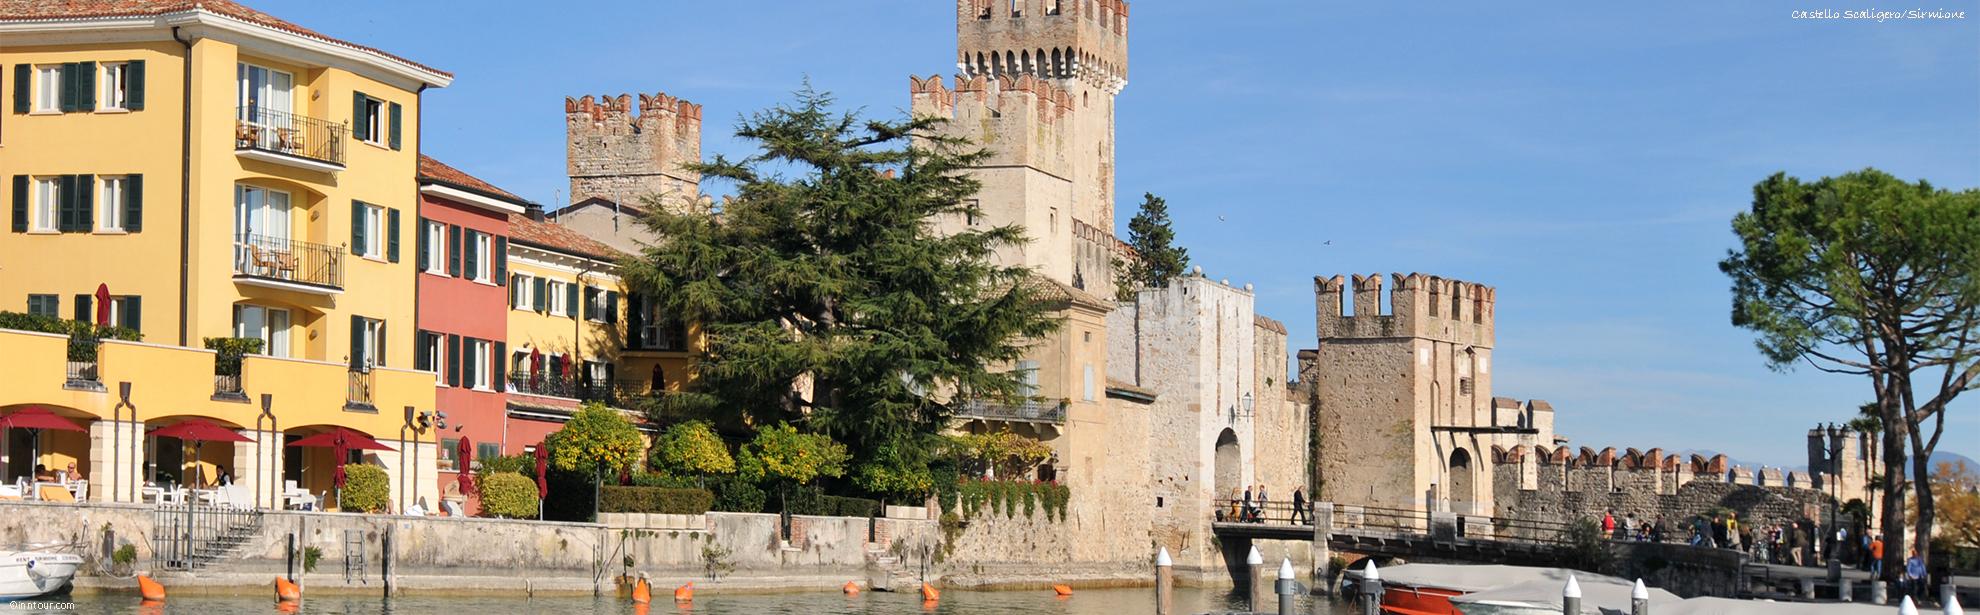 Oklassinntour_Castello-Scaligero_Sirmione_DSC_1090